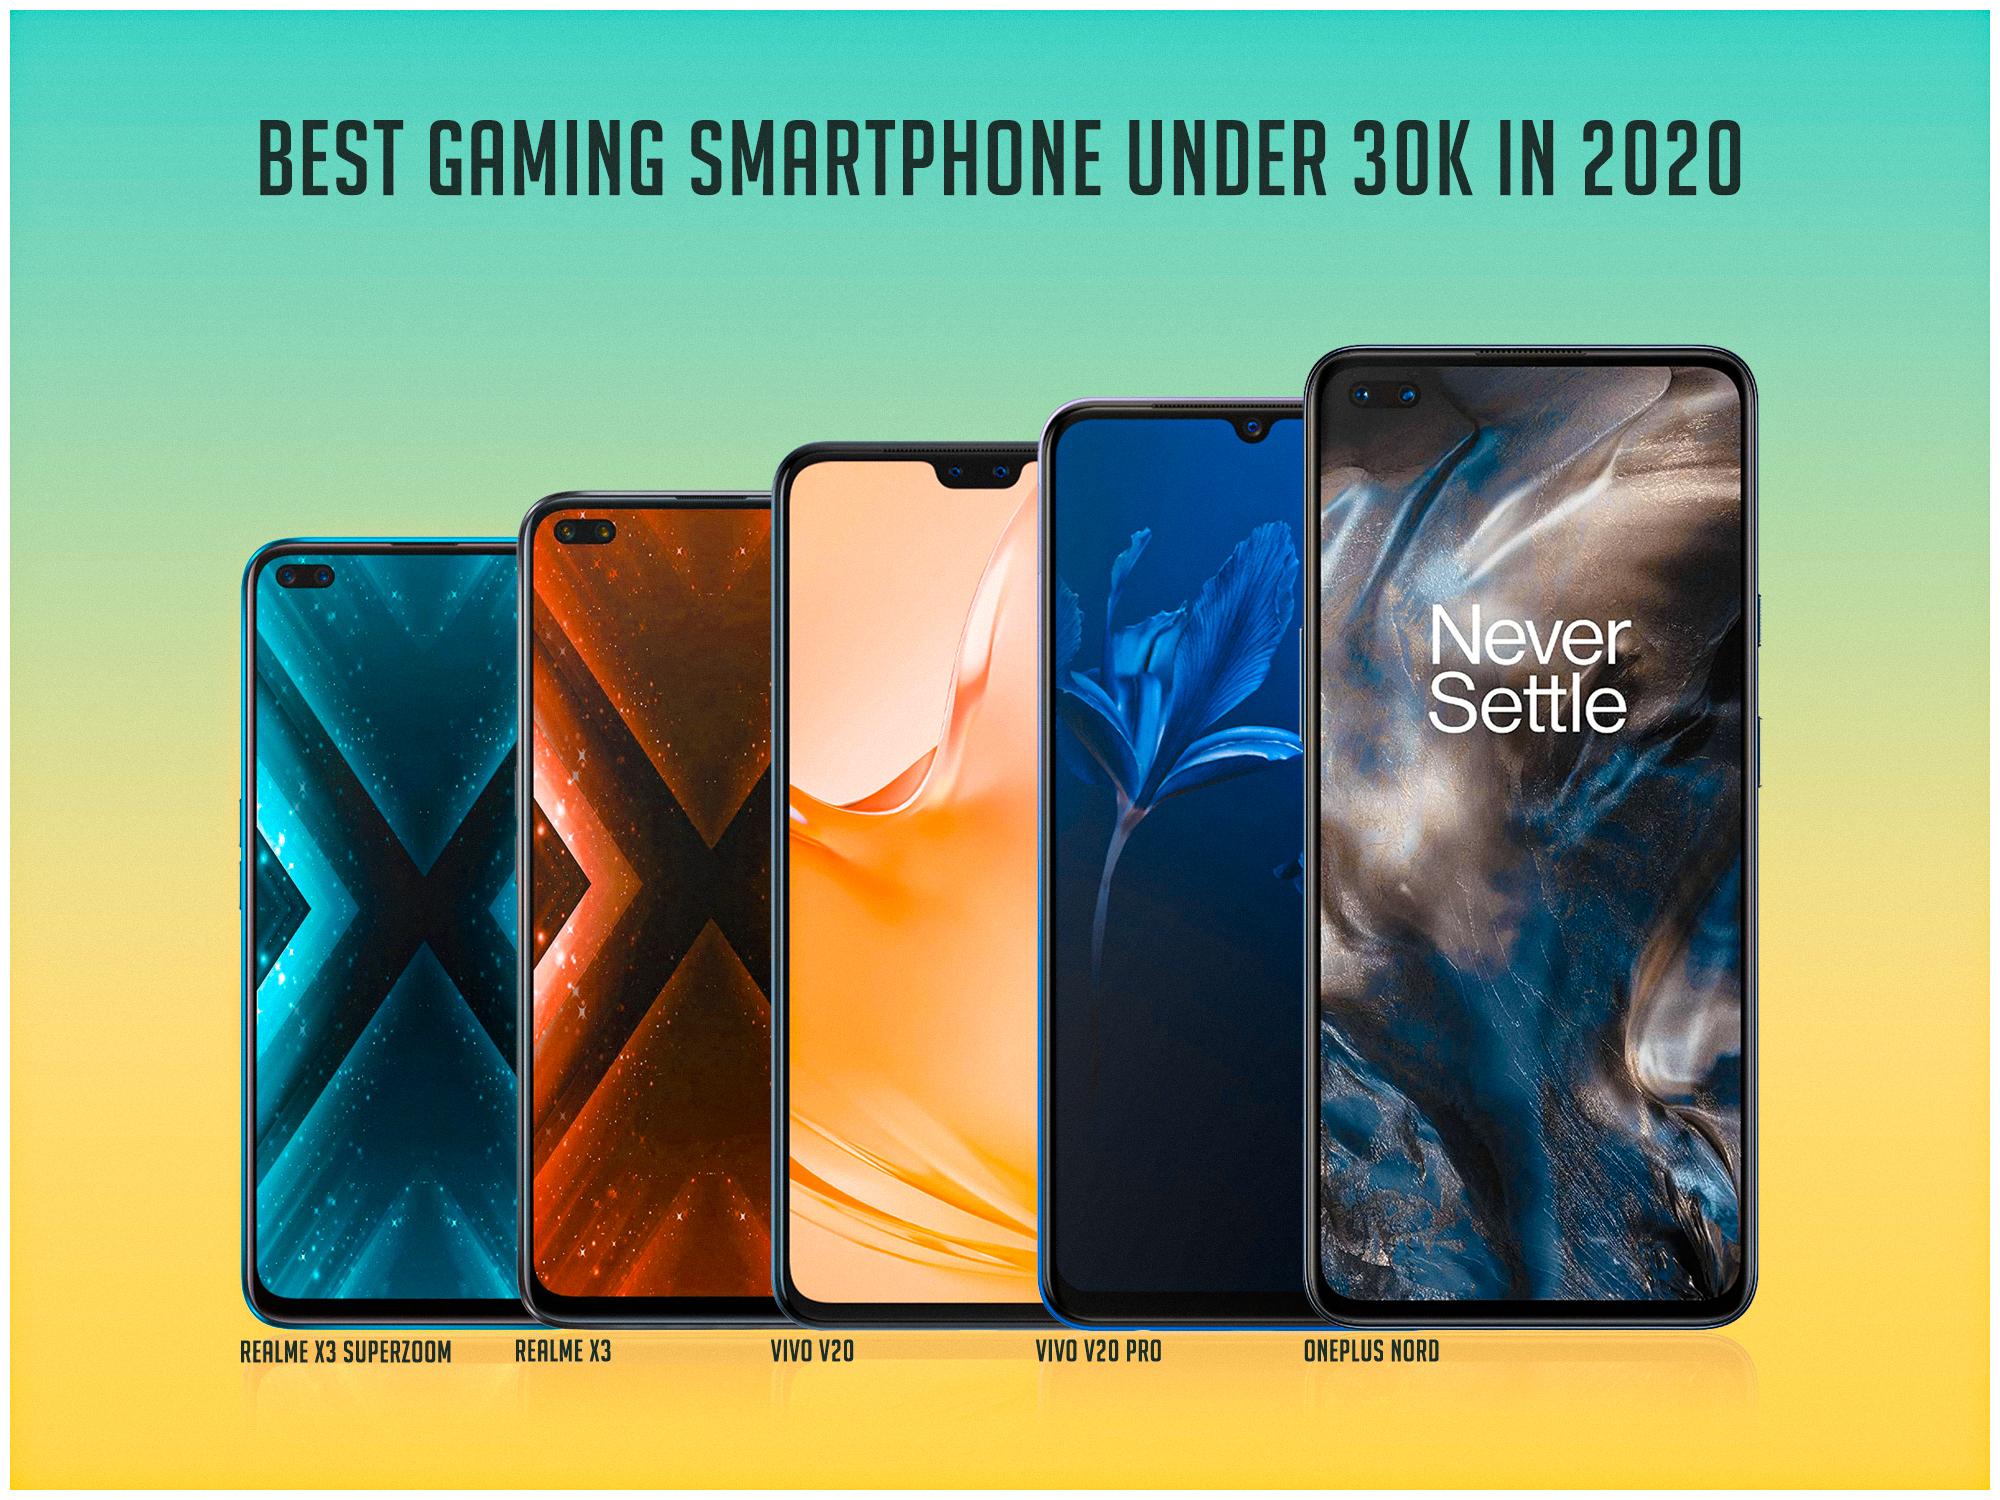 Best gaming smartphone under 30k in 2020